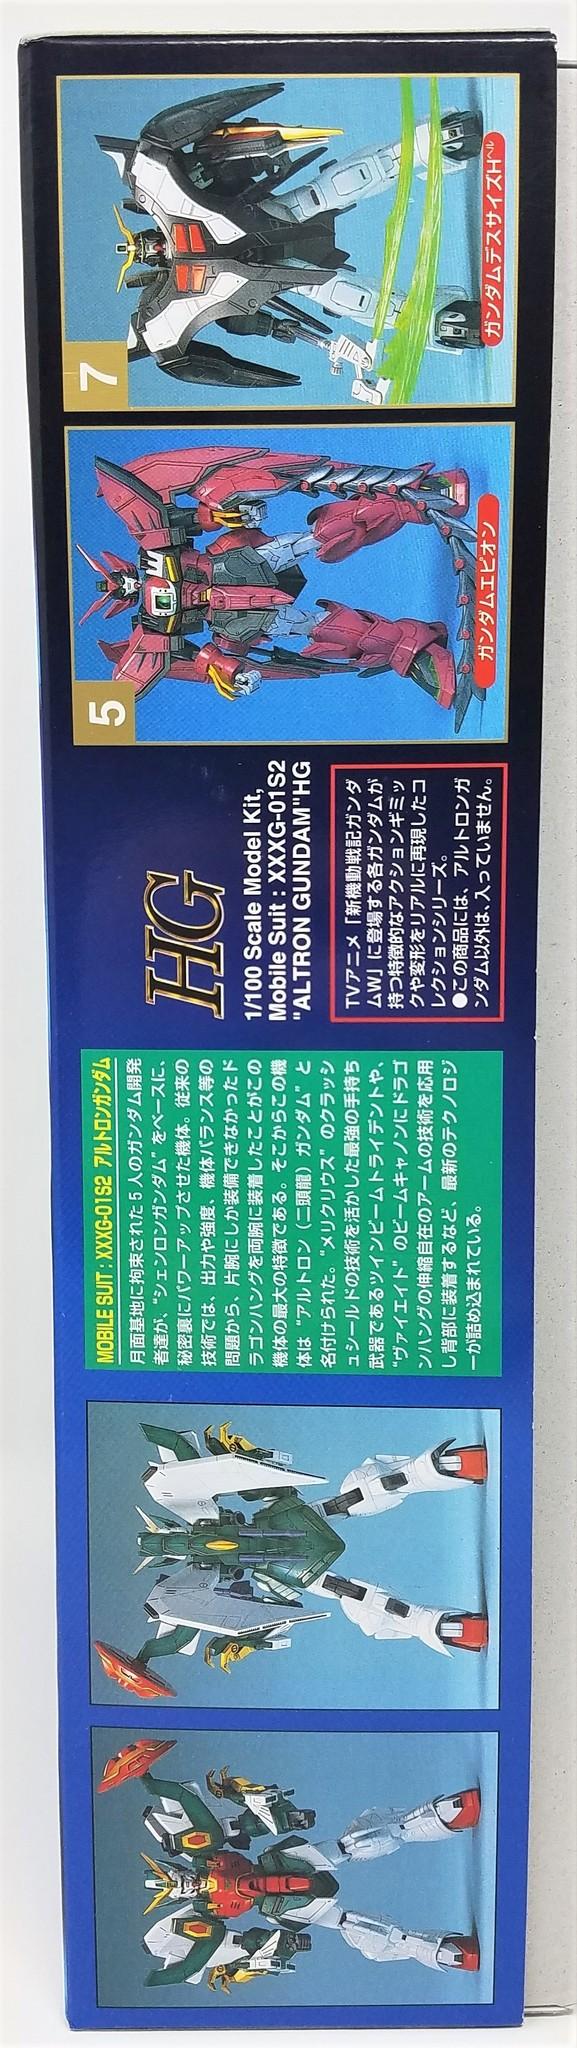 Bandai Gundam 1/100 Snap Model Kit: Altron Gundam